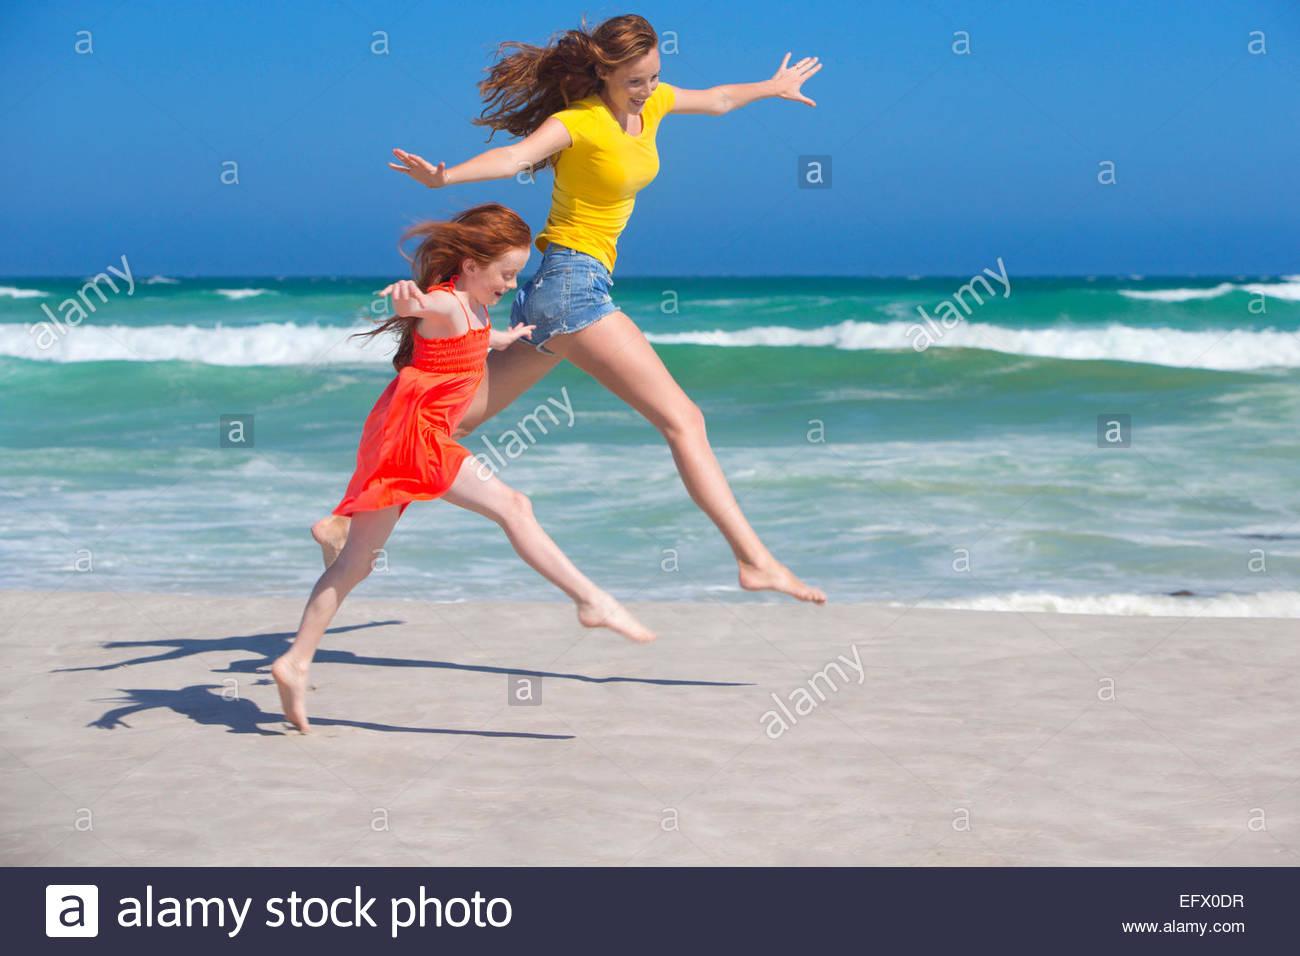 Madre e hija, saltando, con los brazos extendidos, en sunny beach Imagen De Stock